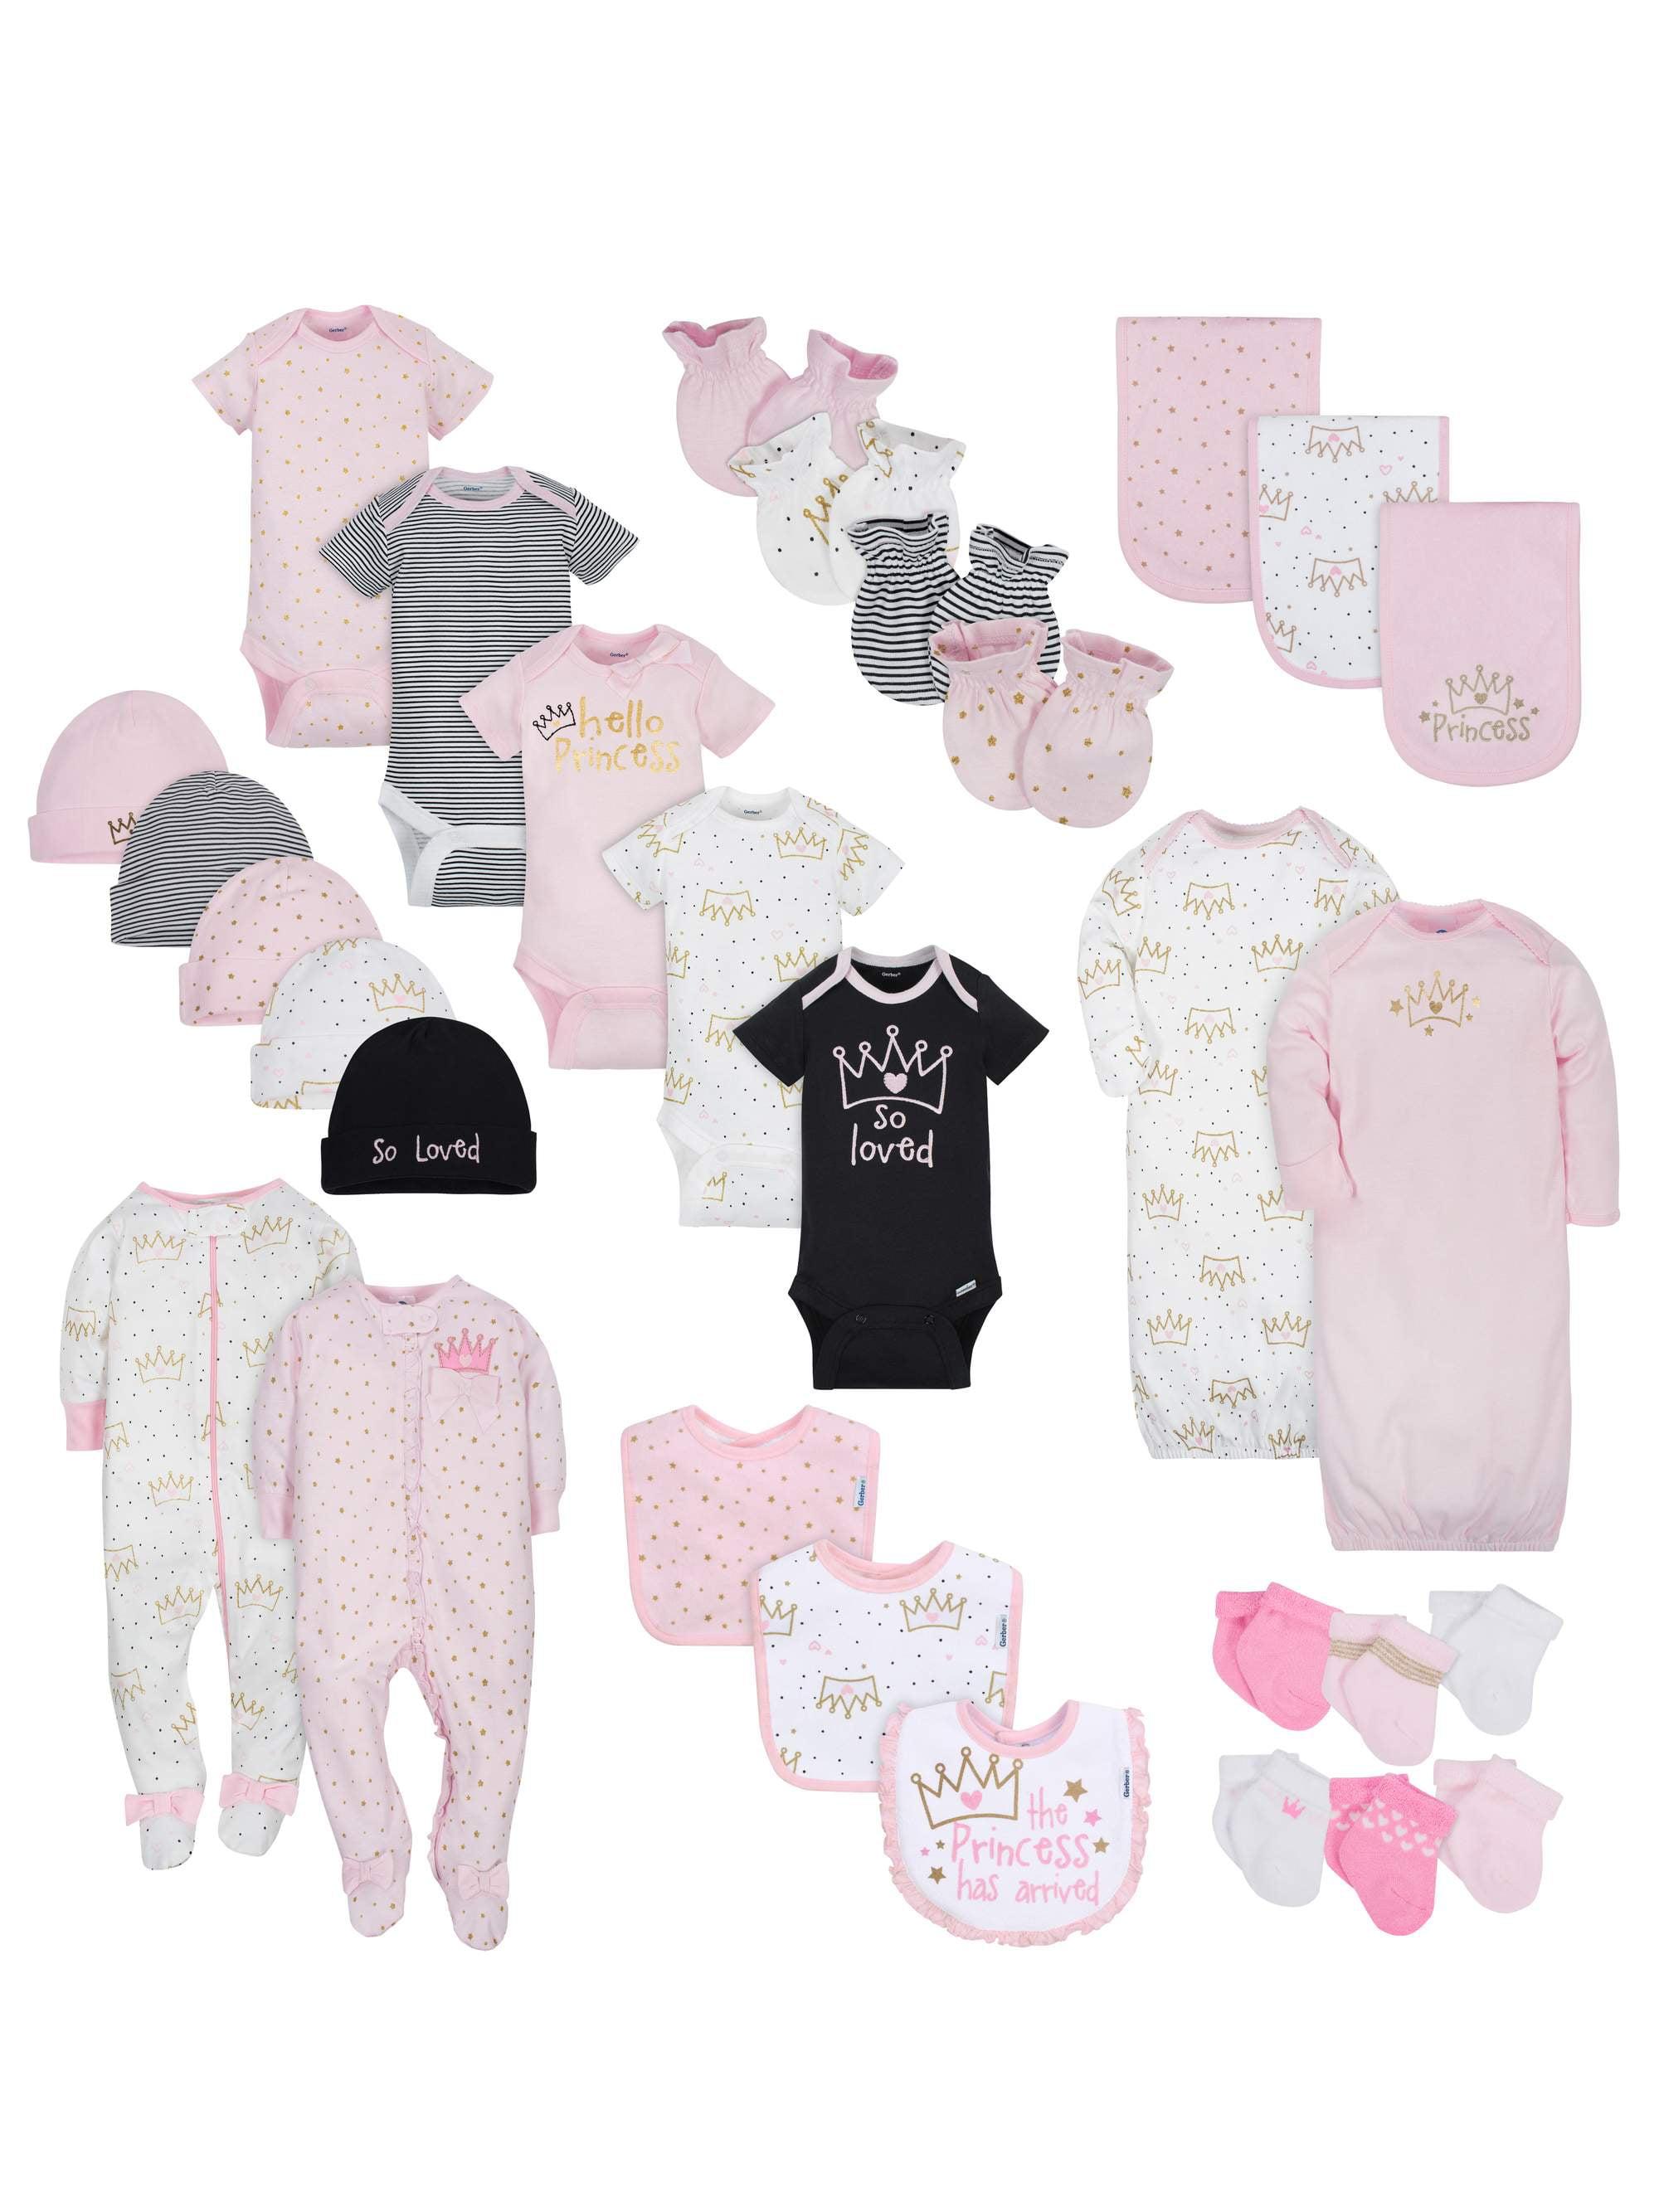 Gerber Layette Essentials Baby Shower Gift Set, 30pc (Baby Girls) by Gerber Childrenswear LLC